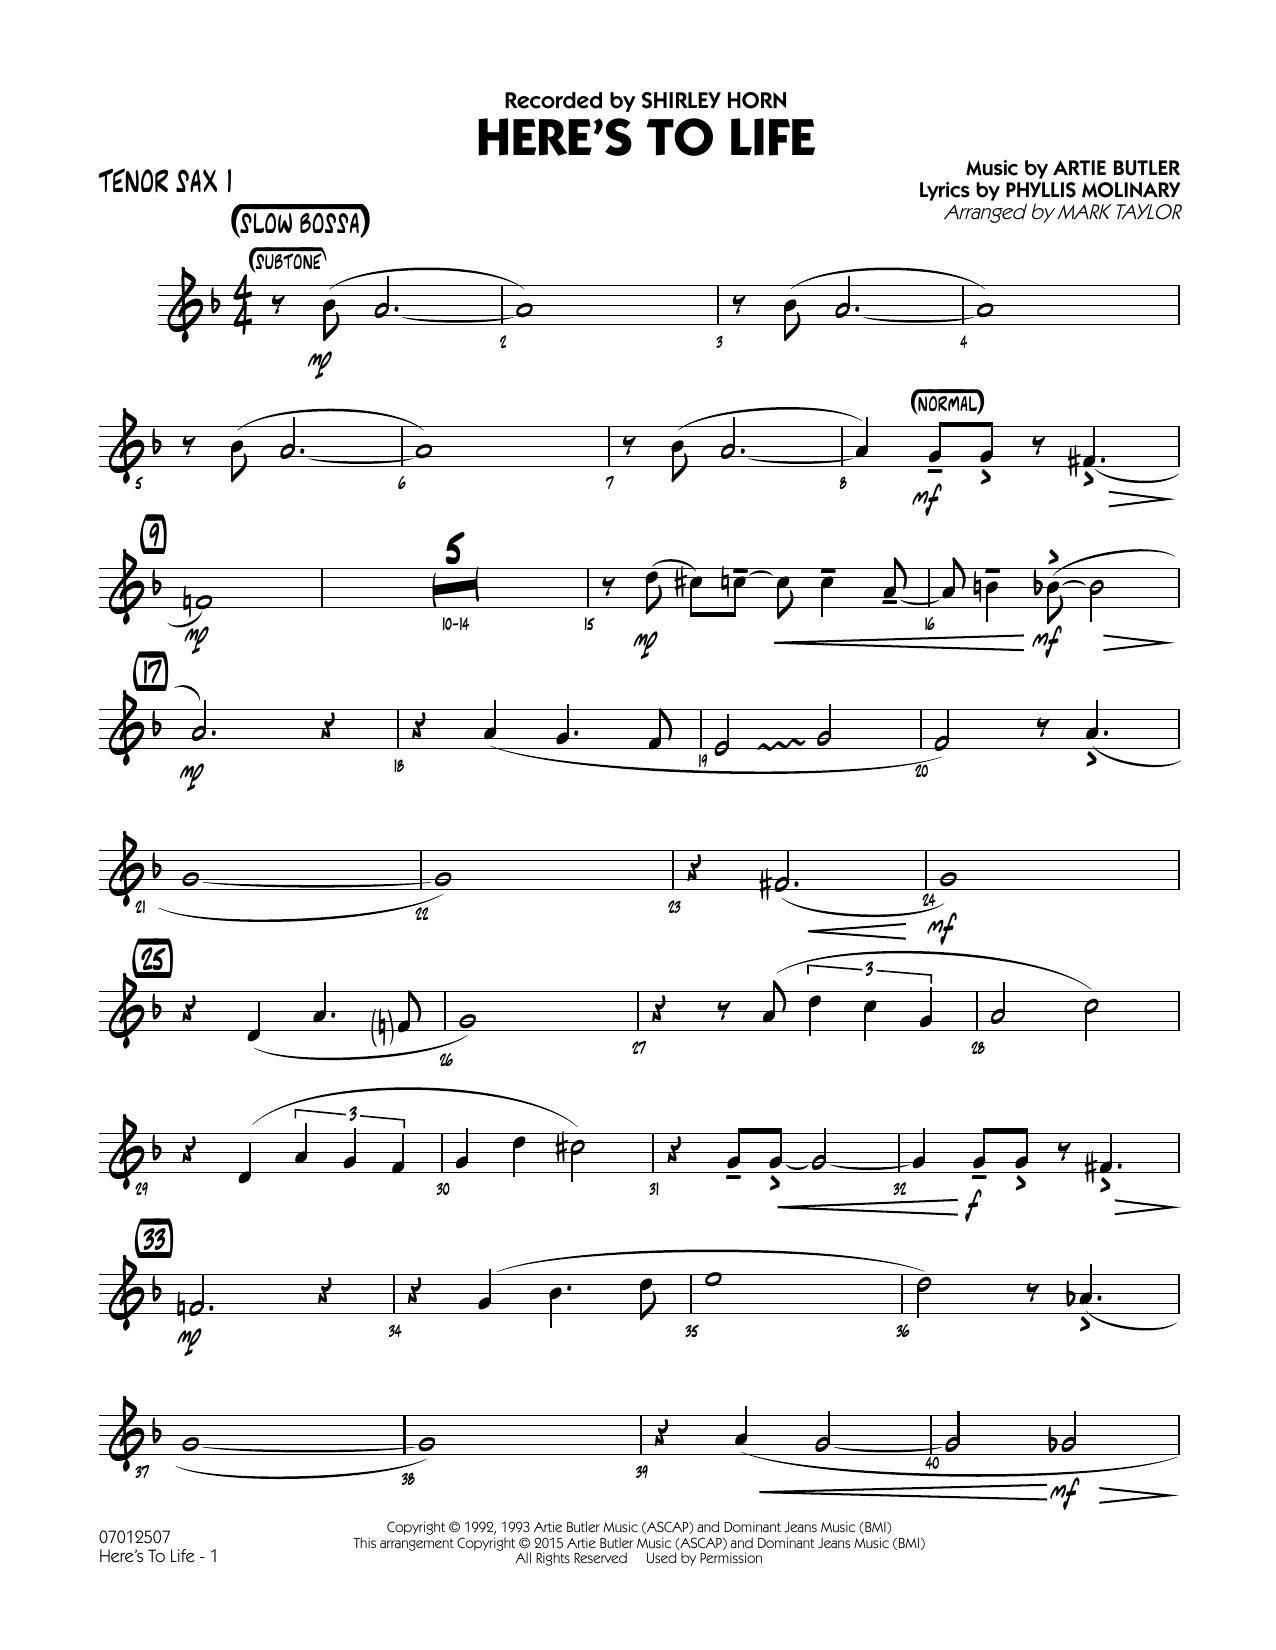 Here's To Life (Key: C minor) - Tenor Sax 1 (Jazz Ensemble)